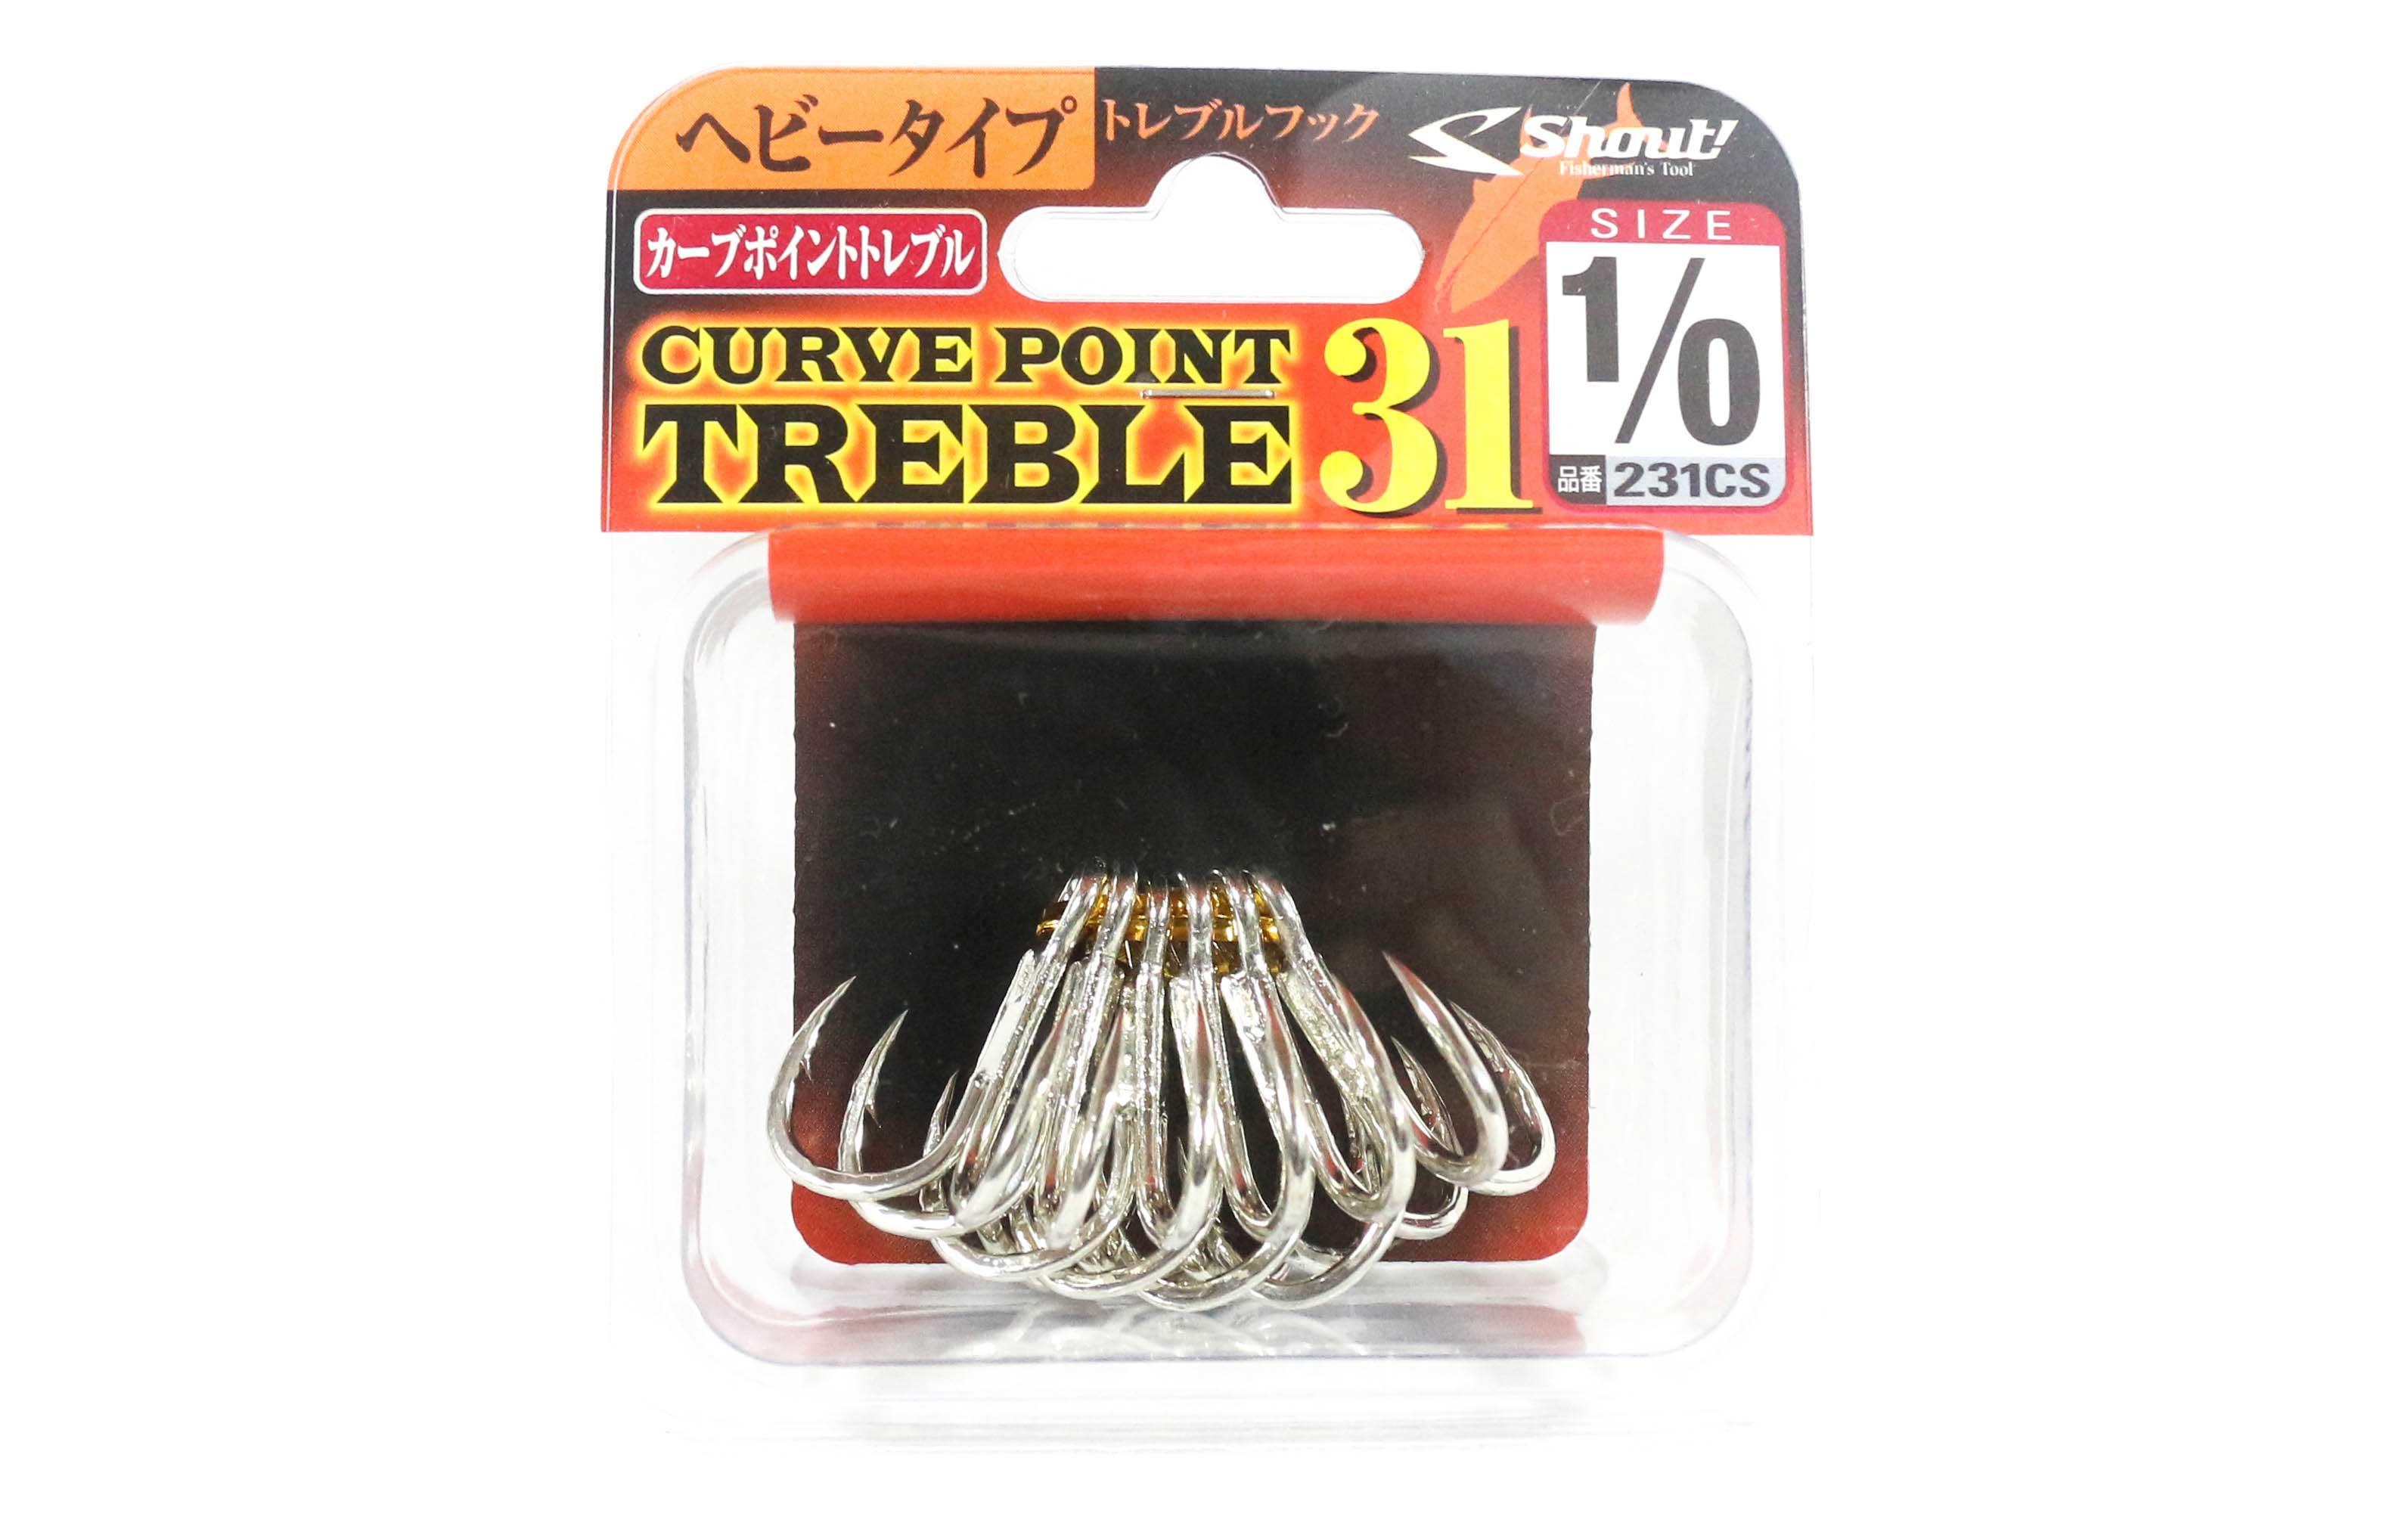 Shout 231-CS Curve Point Treble Hook Heavy Duty Size 1/0 (1542)